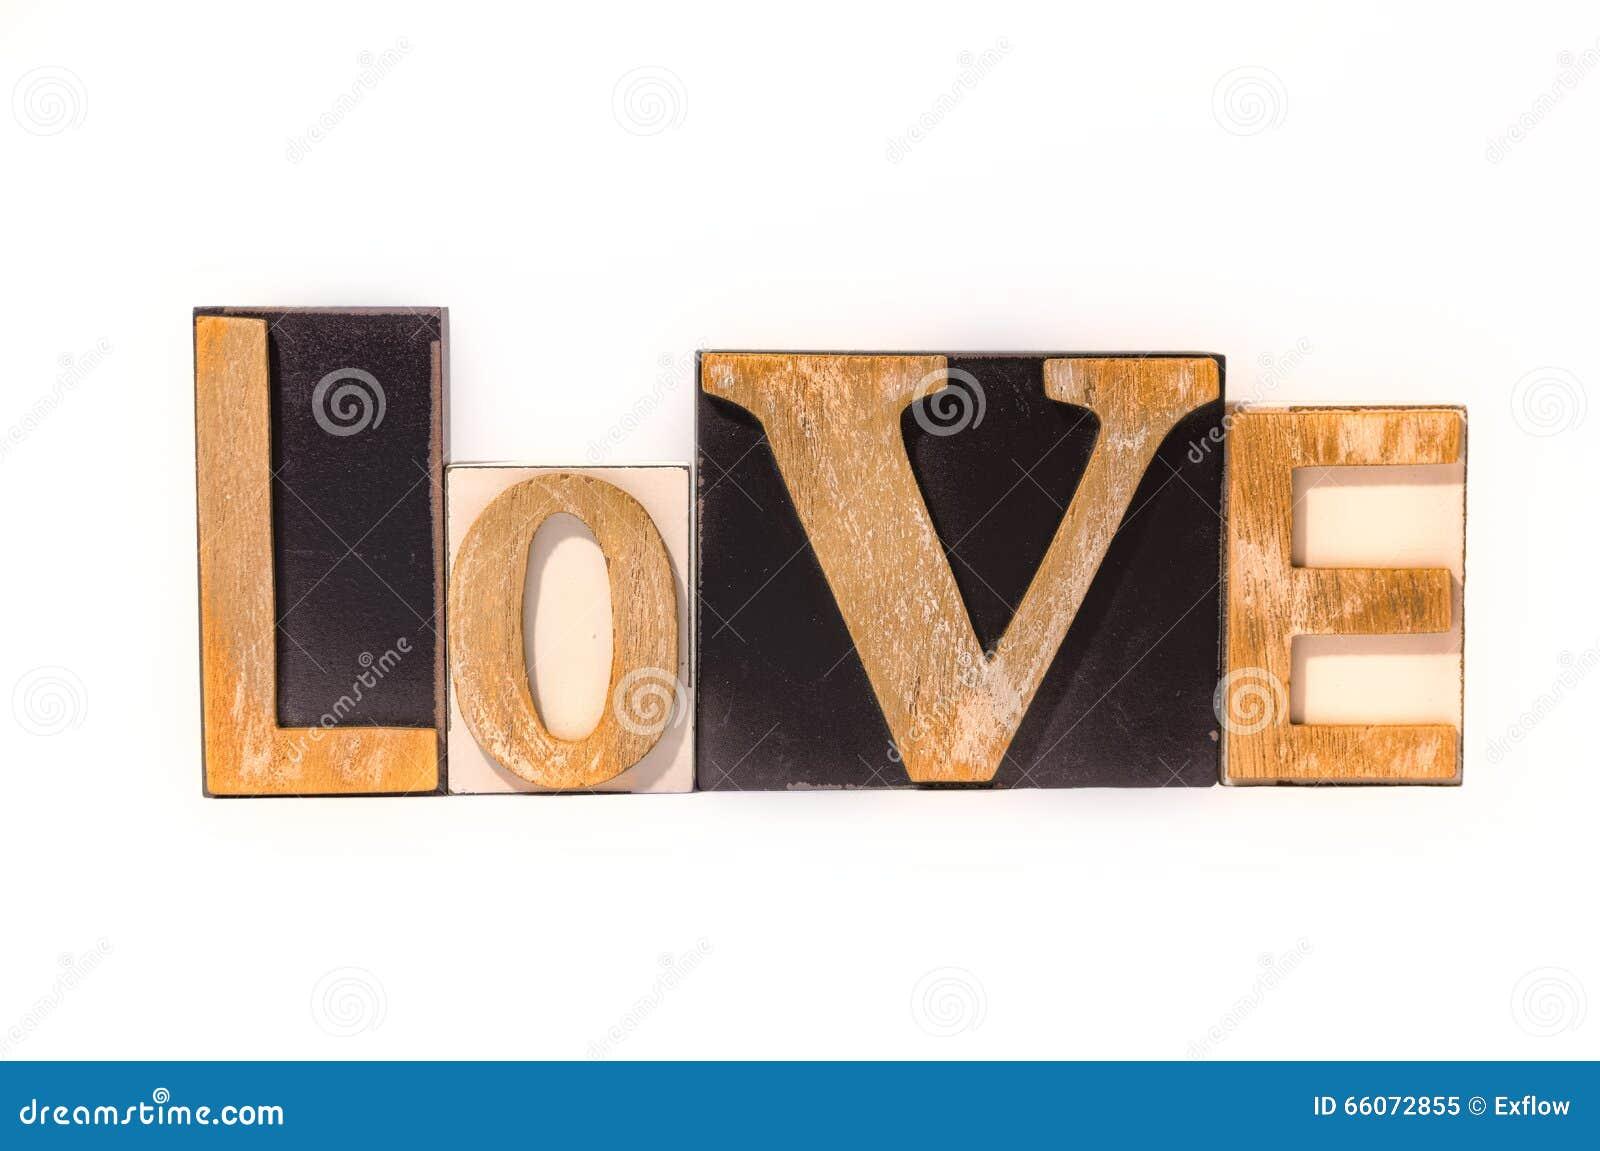 love made of wooden letter blocks